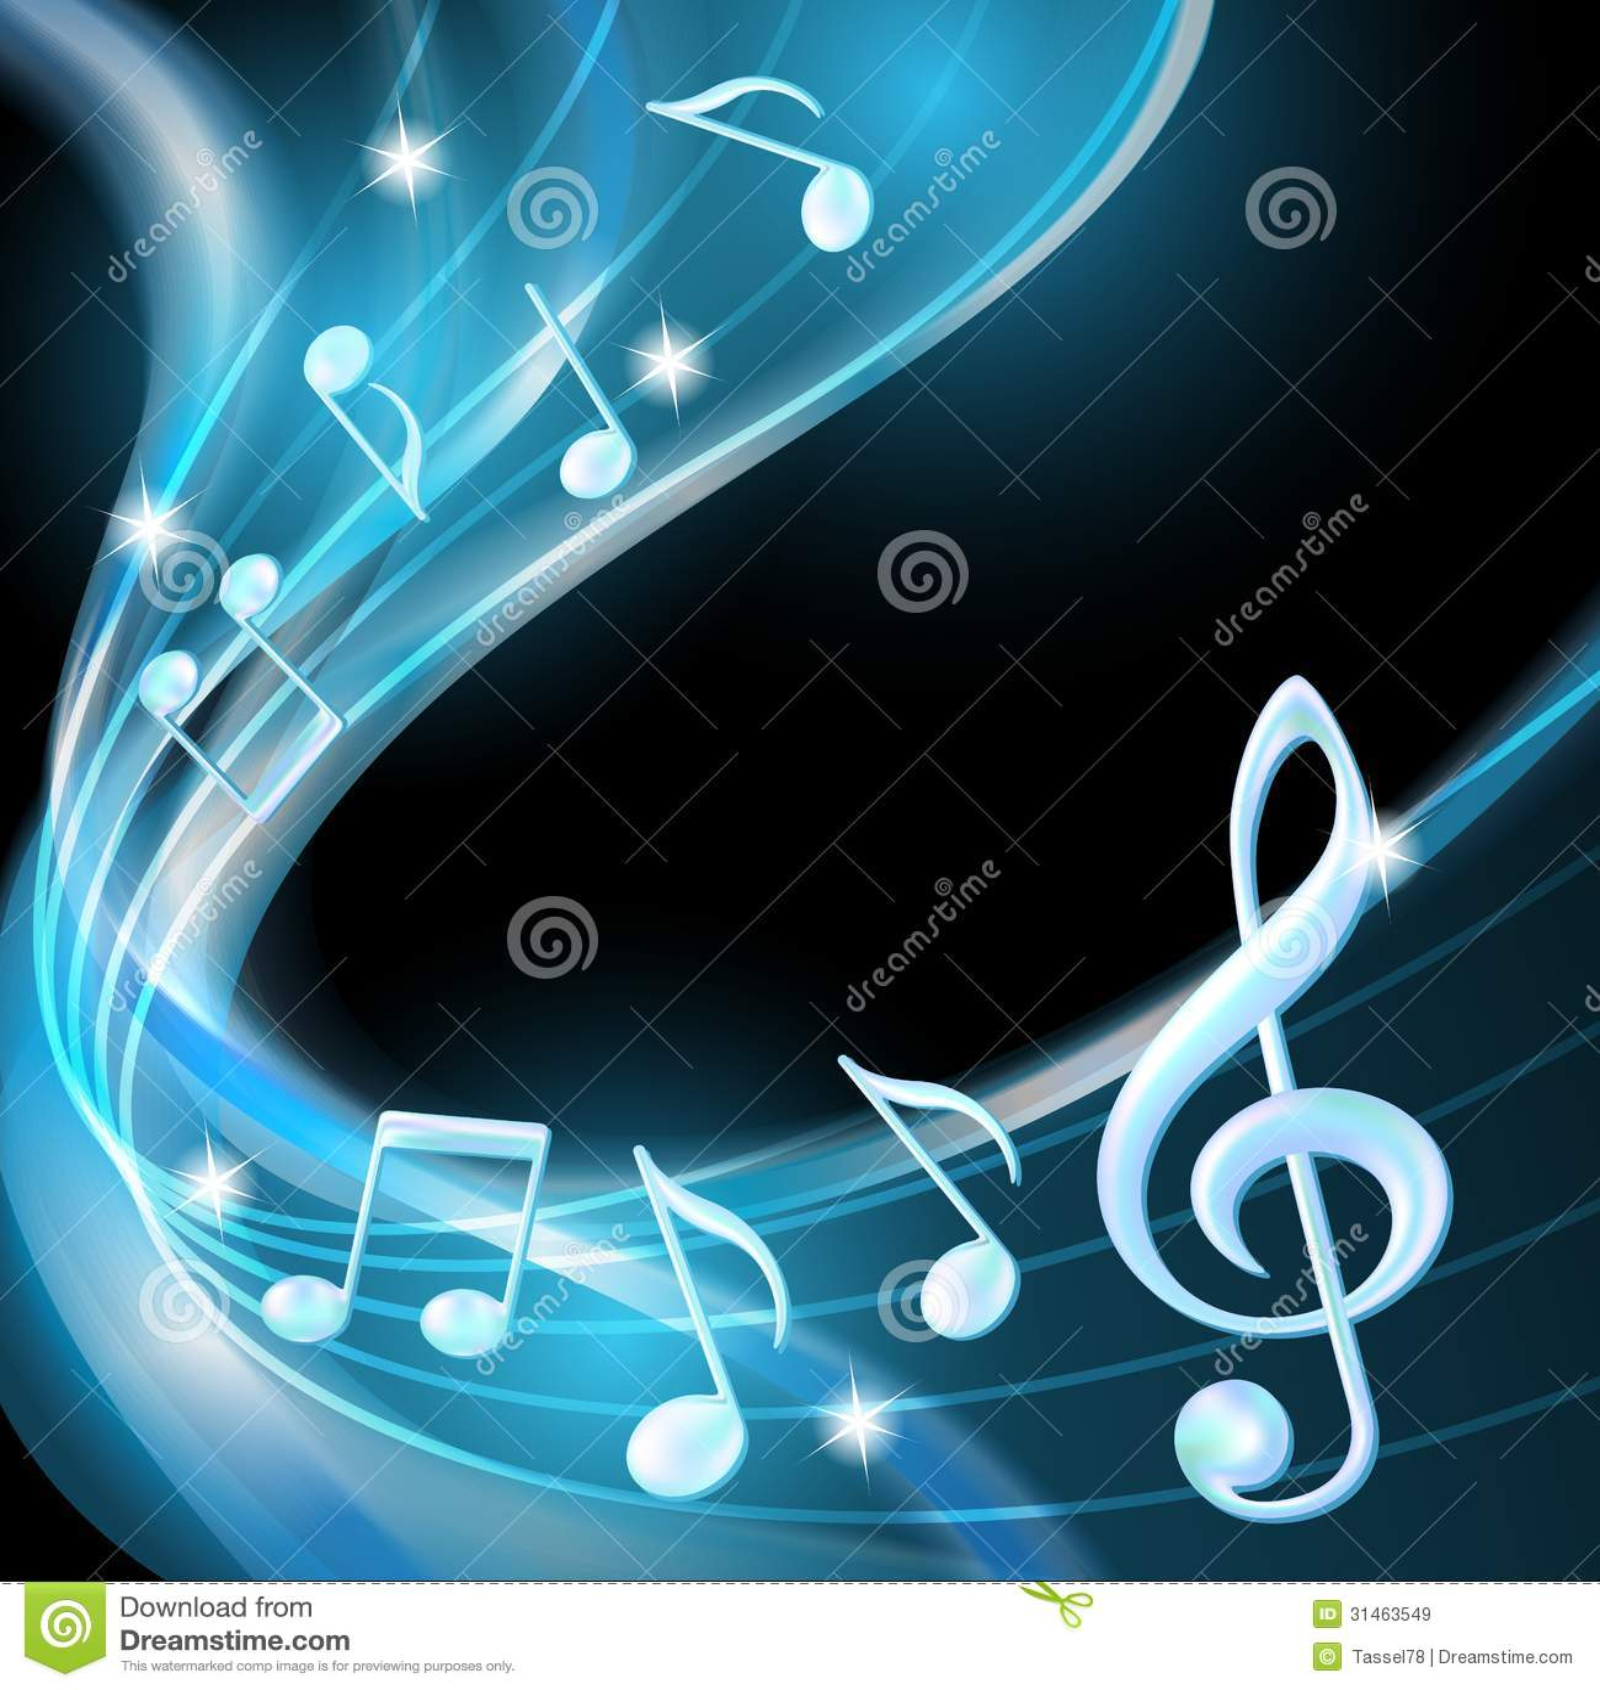 Music Notes Free Vector Art  5999 Free Downloads  Vecteezy